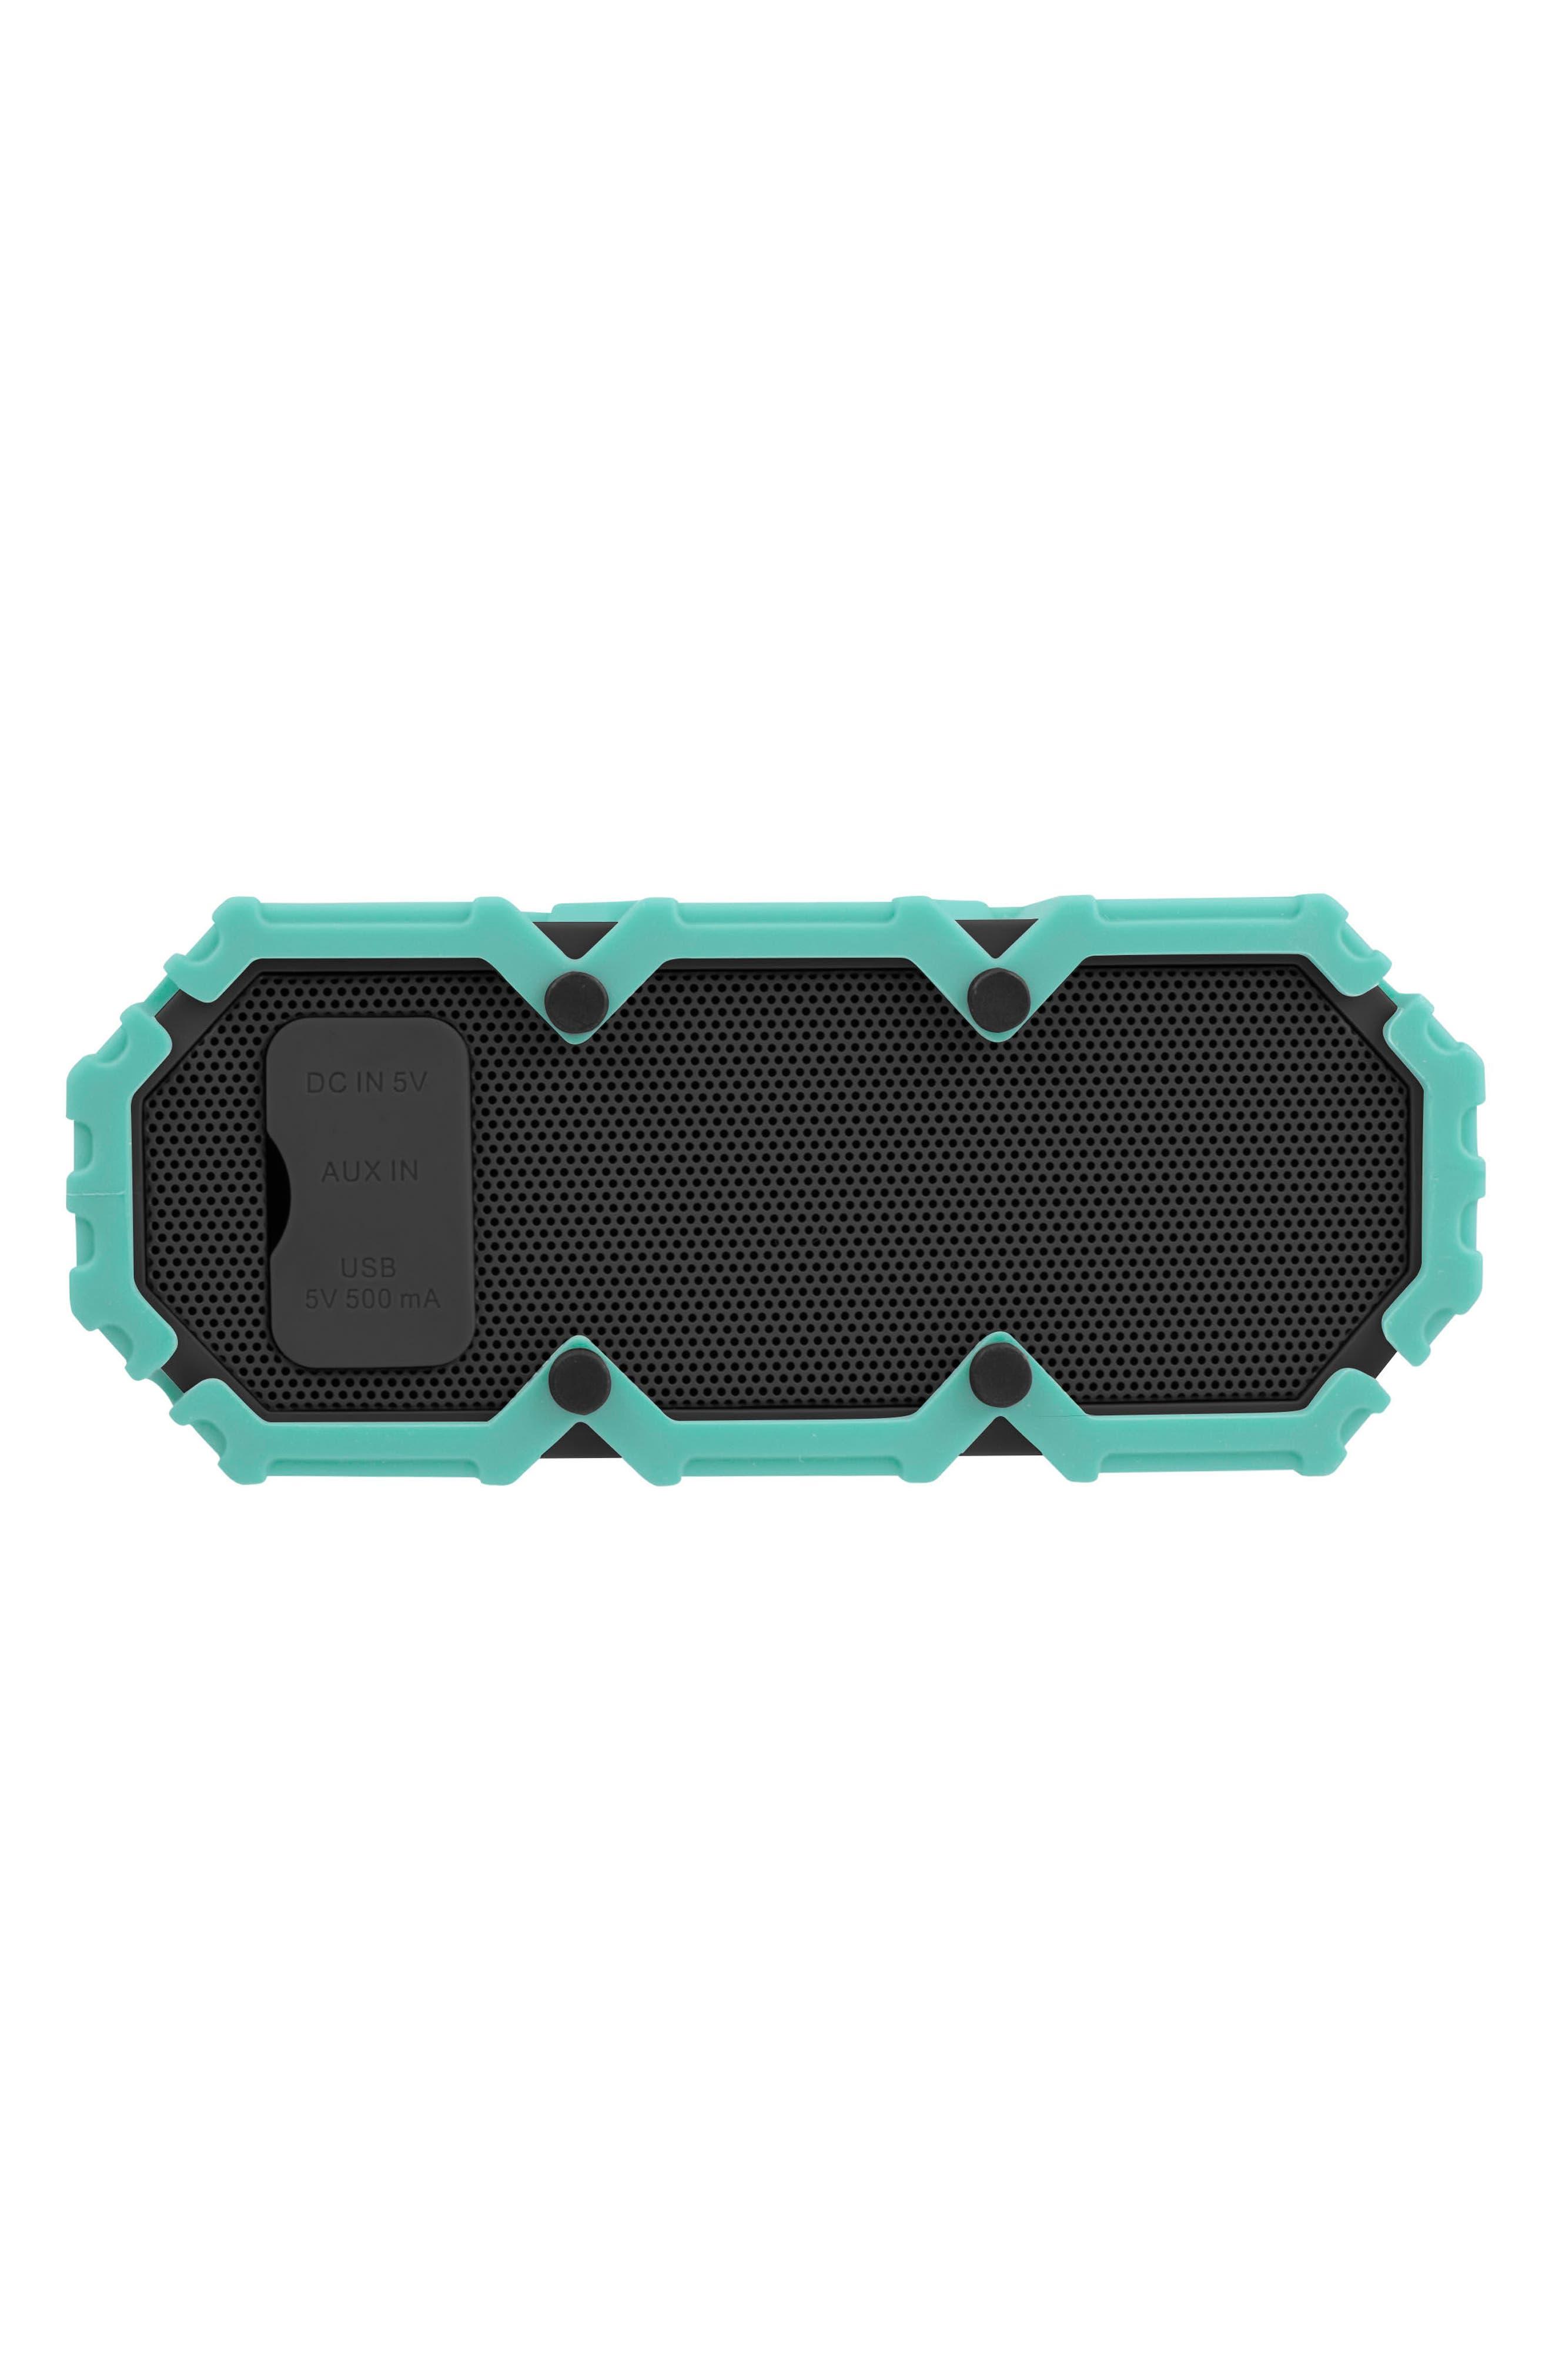 Mini Lifejacket S3 Waterproof Wireless Speaker,                             Alternate thumbnail 2, color,                             MINT GREEN/ DARK GREY